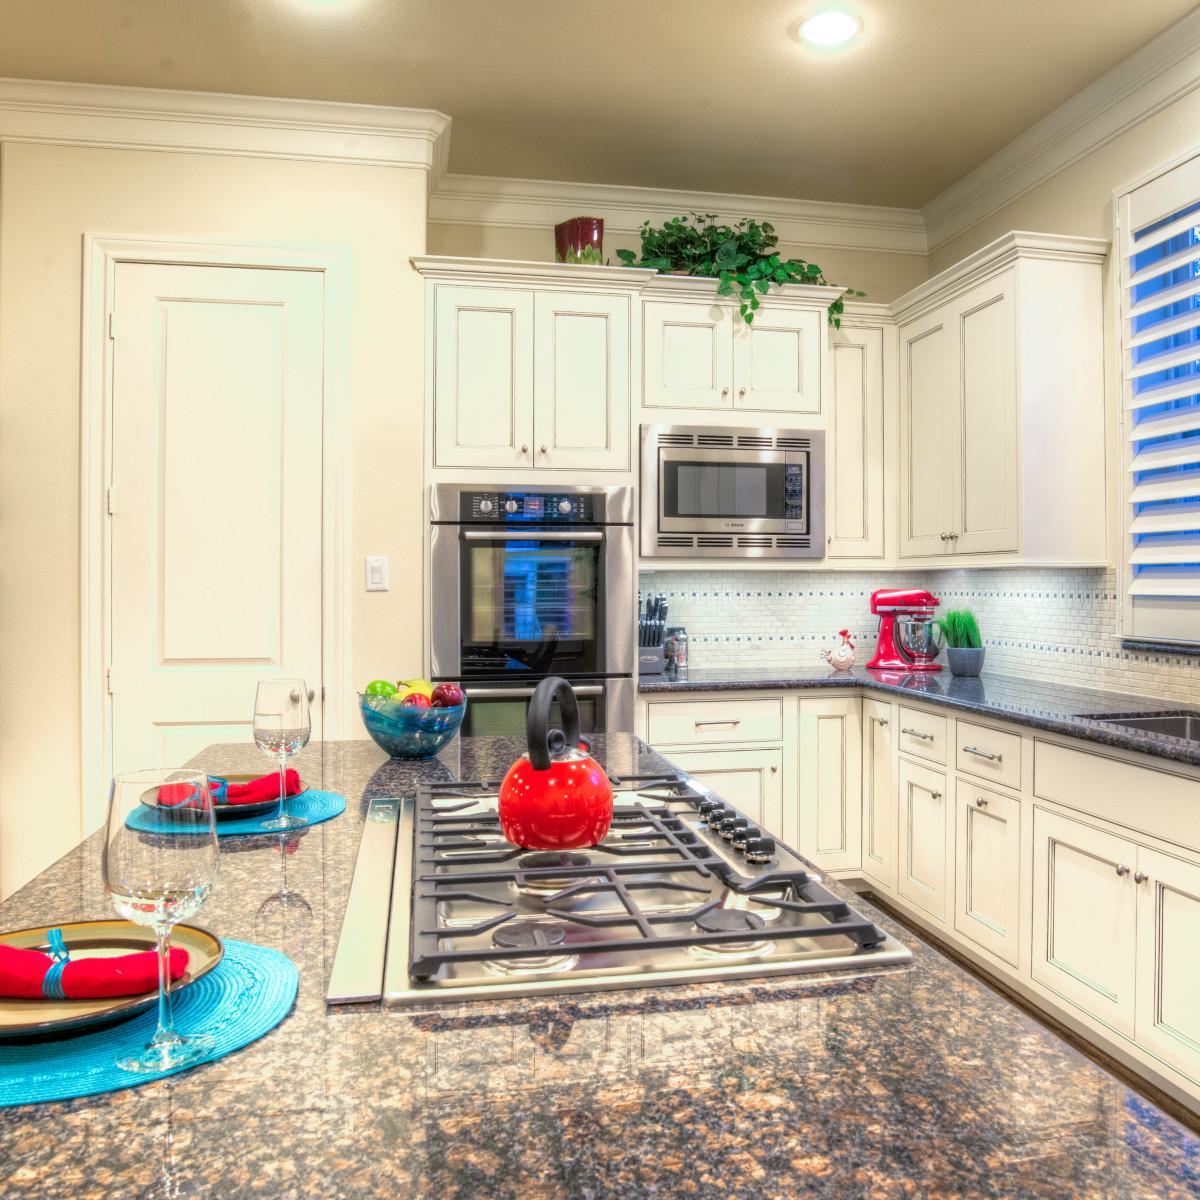 Houston, 1216 Bomar, June 2015, kitchen island